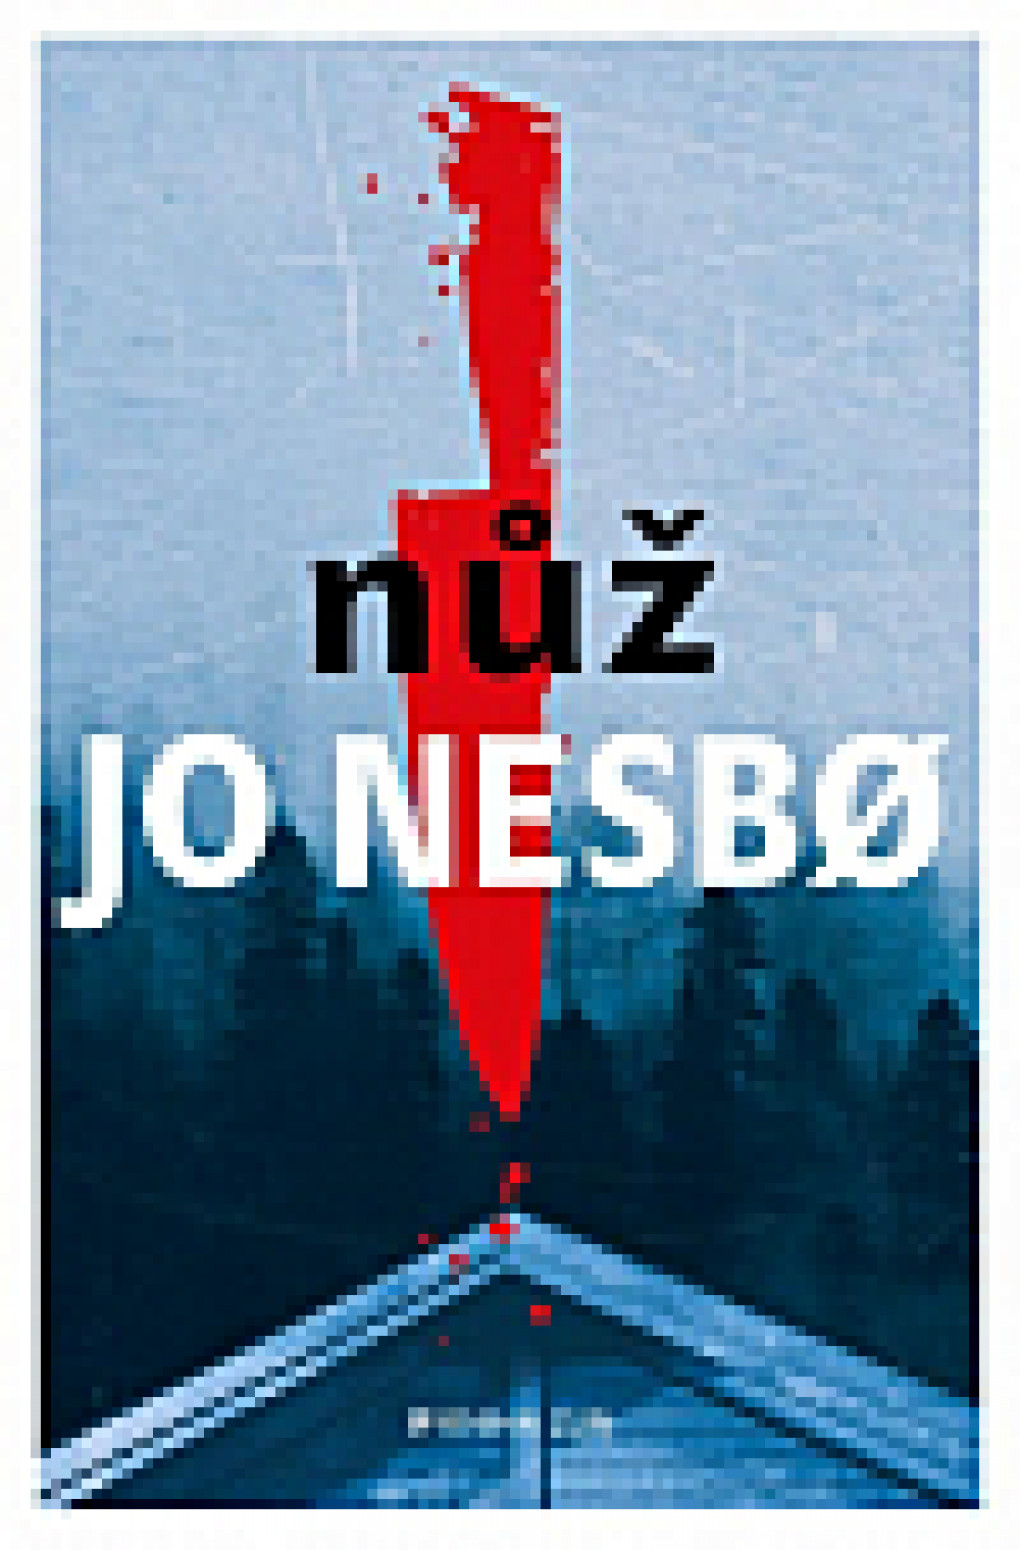 nuz-lx9-407982.jpg